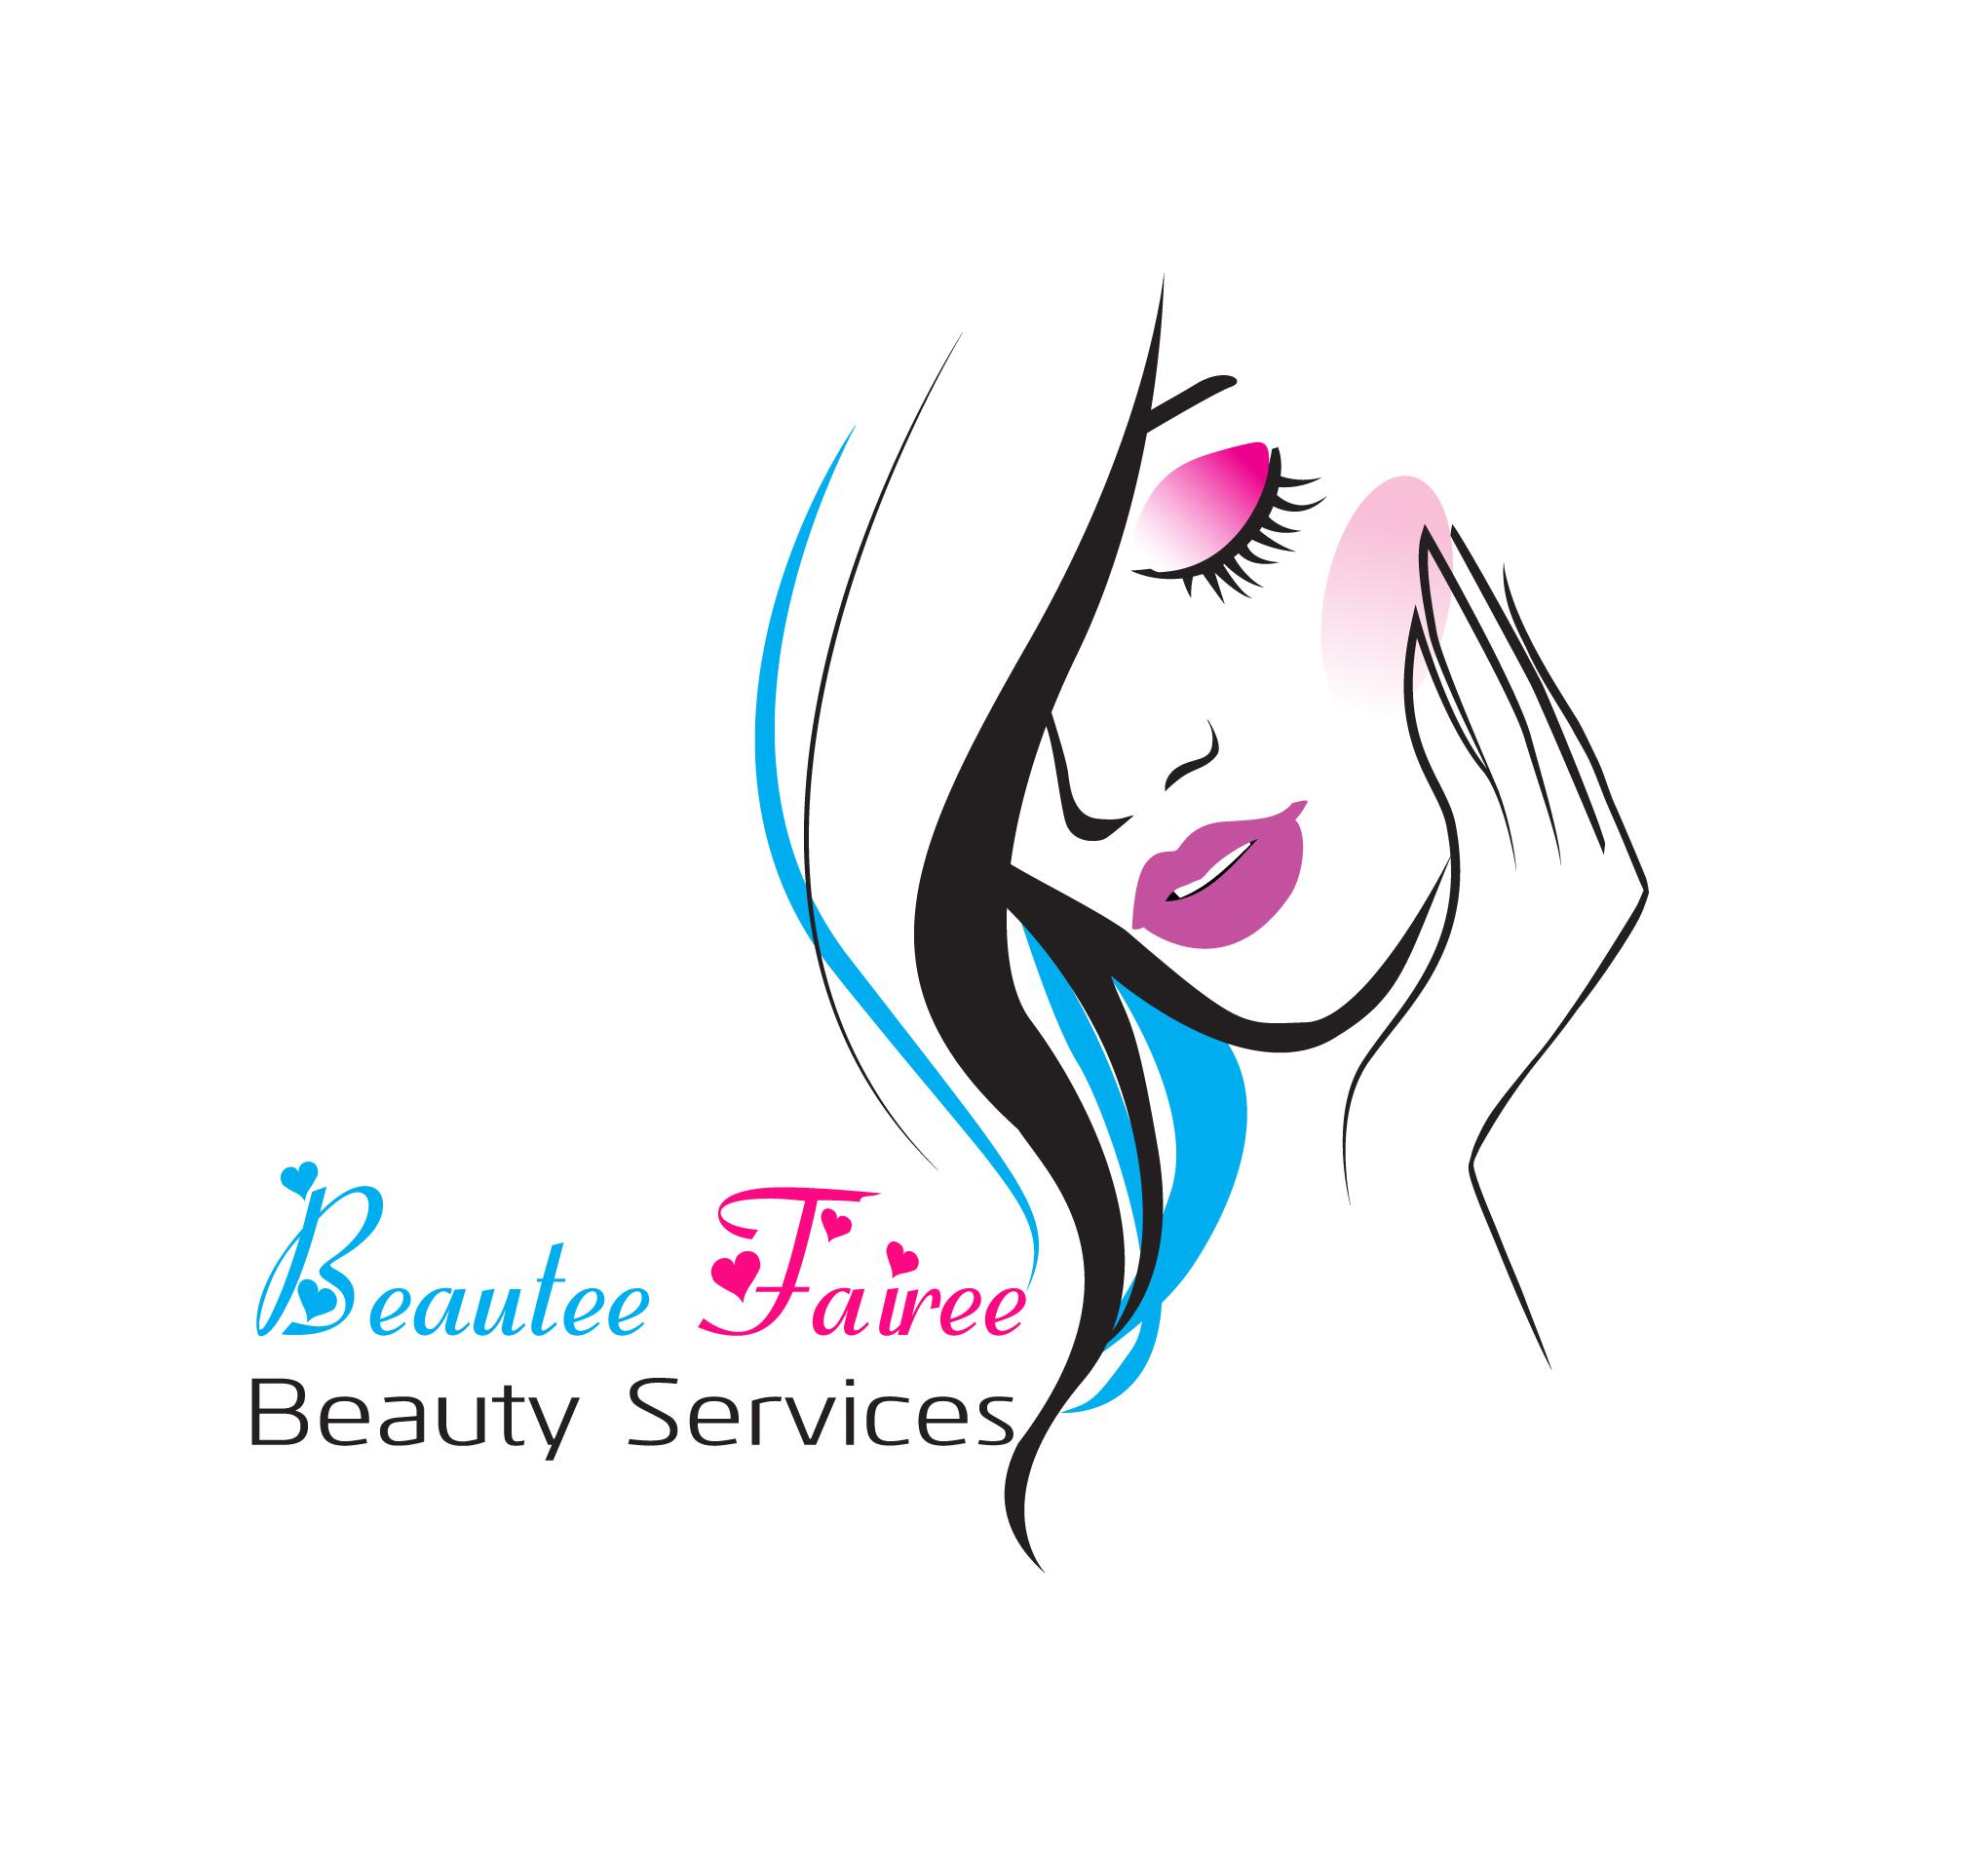 9 hair salon logo design images free beauty salon logo